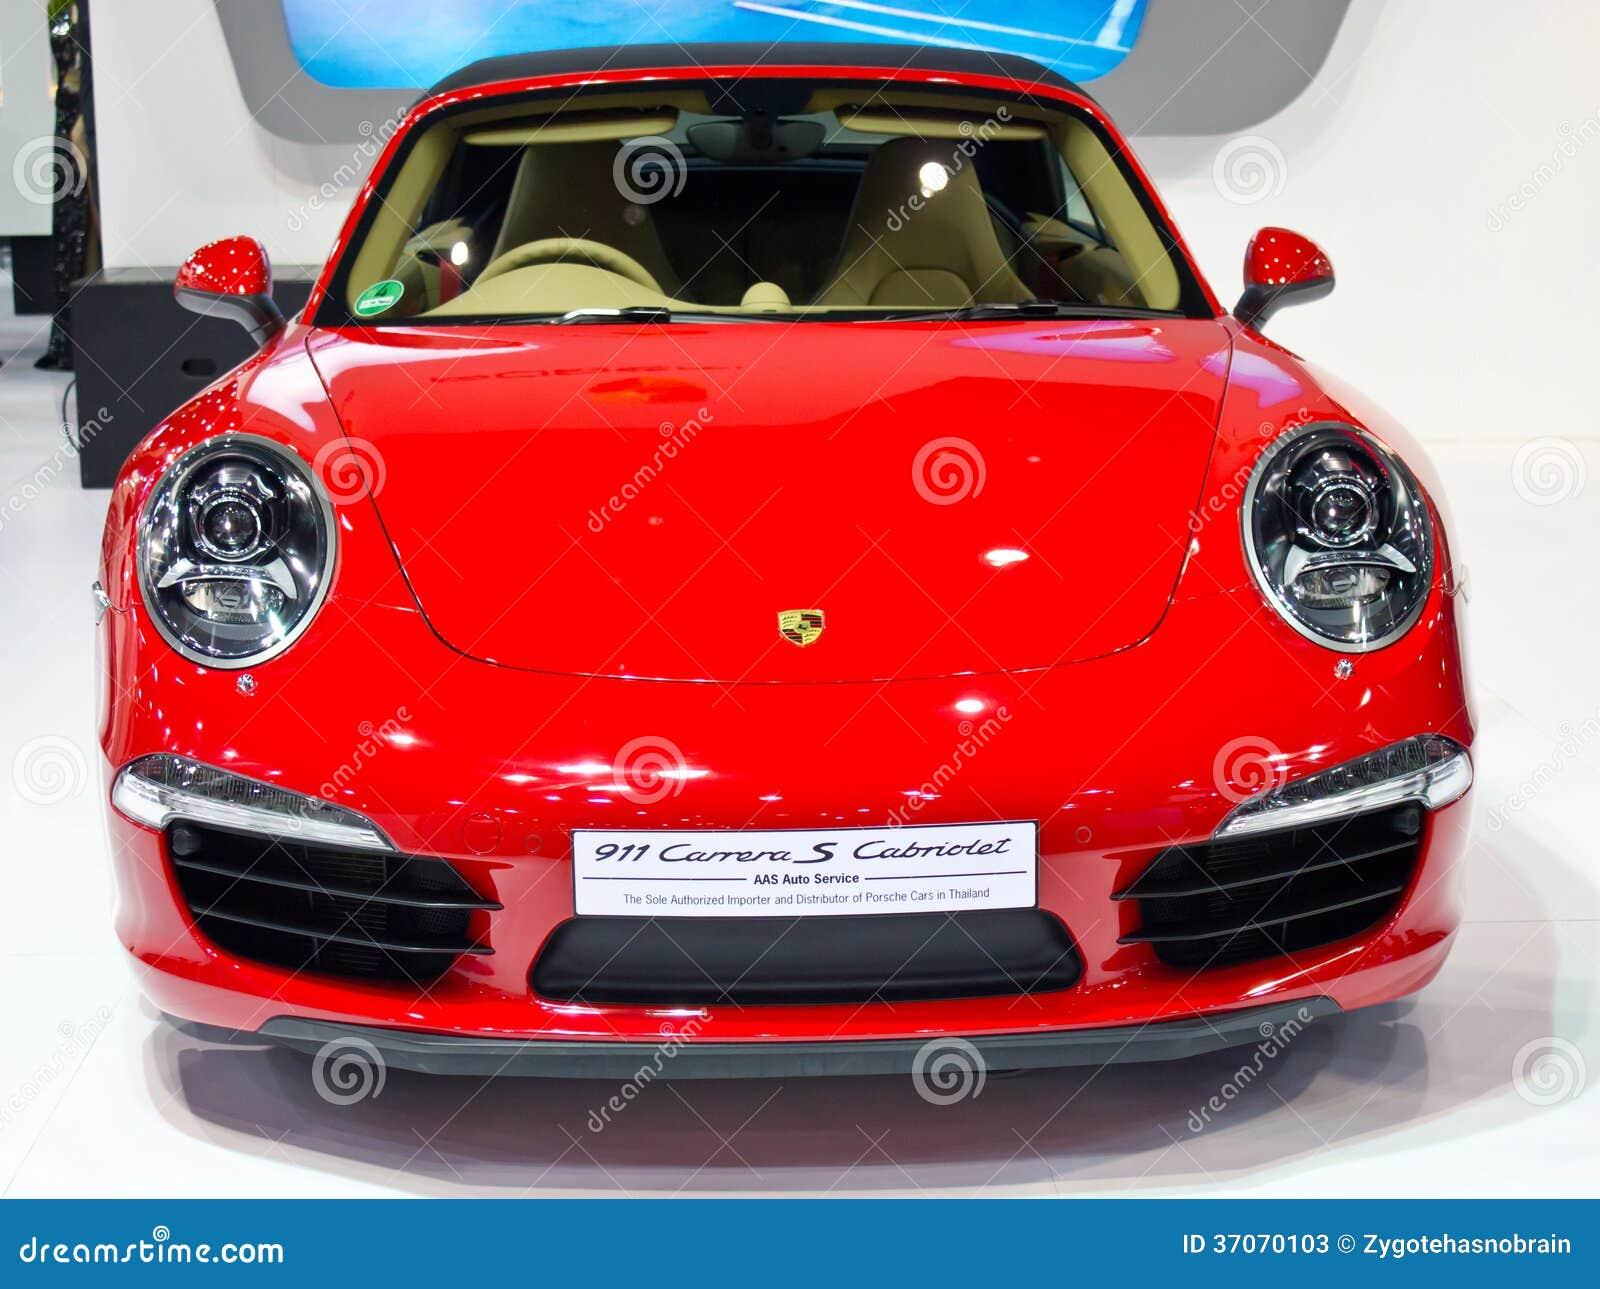 Porsche 911 Carrera S Cabrioletbil.